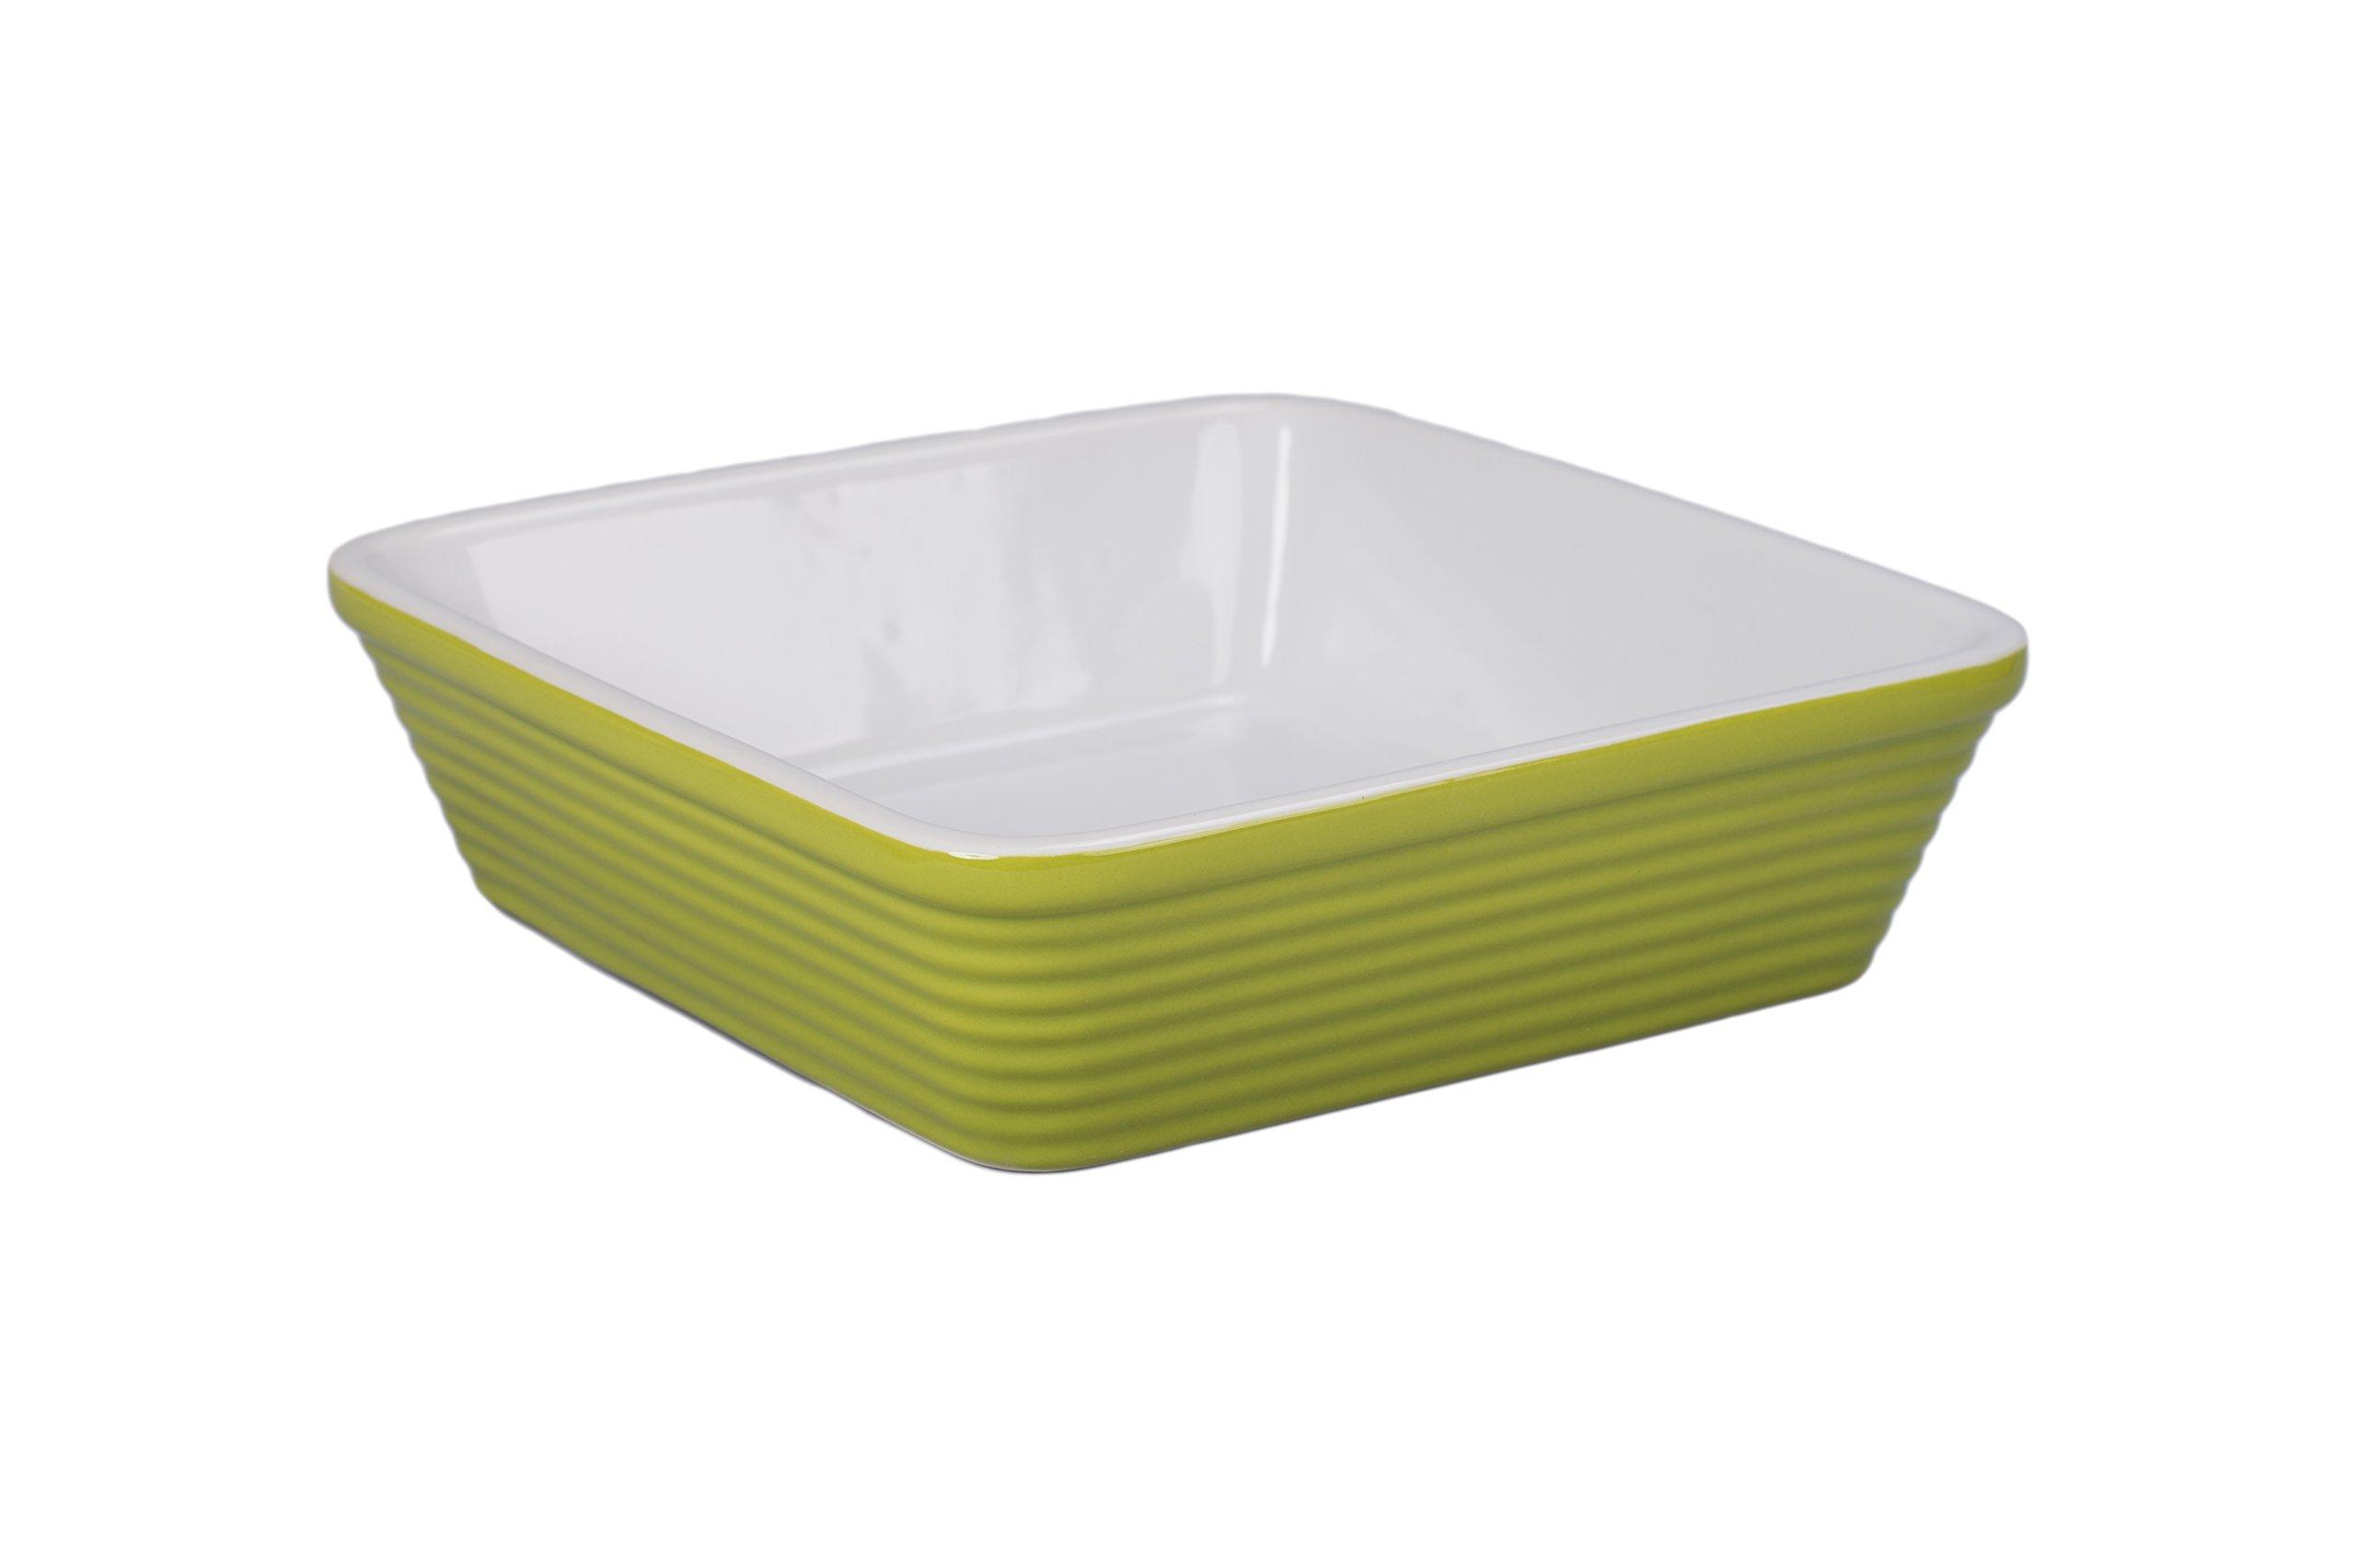 BIA Cordon Bleu 404942+3132S1SIOC Textured Bakeware Square Baker, Grass Green/White